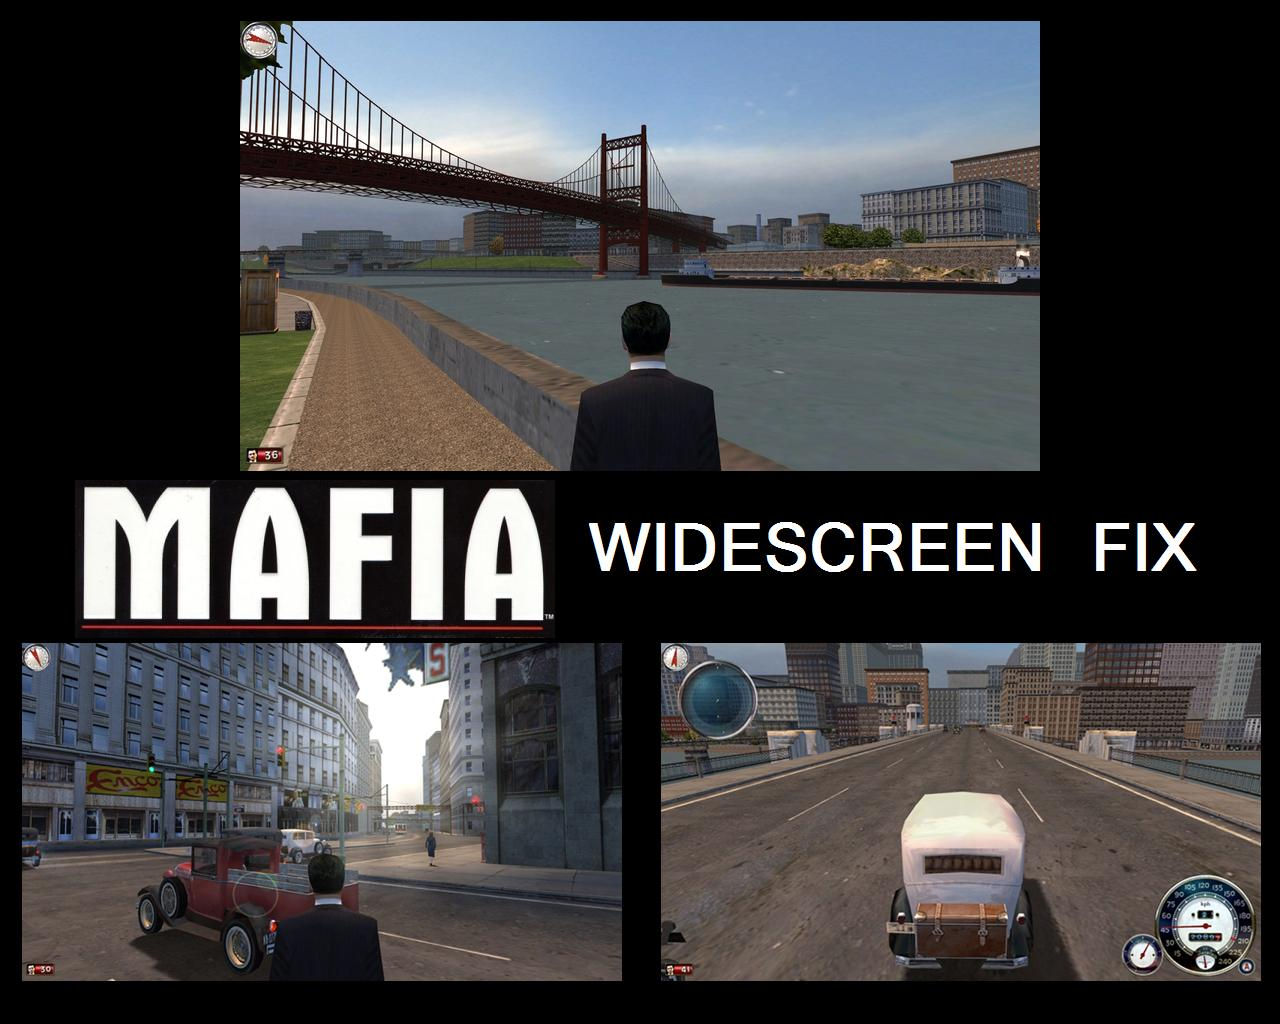 https://media.moddb.com/images/downloads/1/112/111479/MafiaWidescreen.jpg